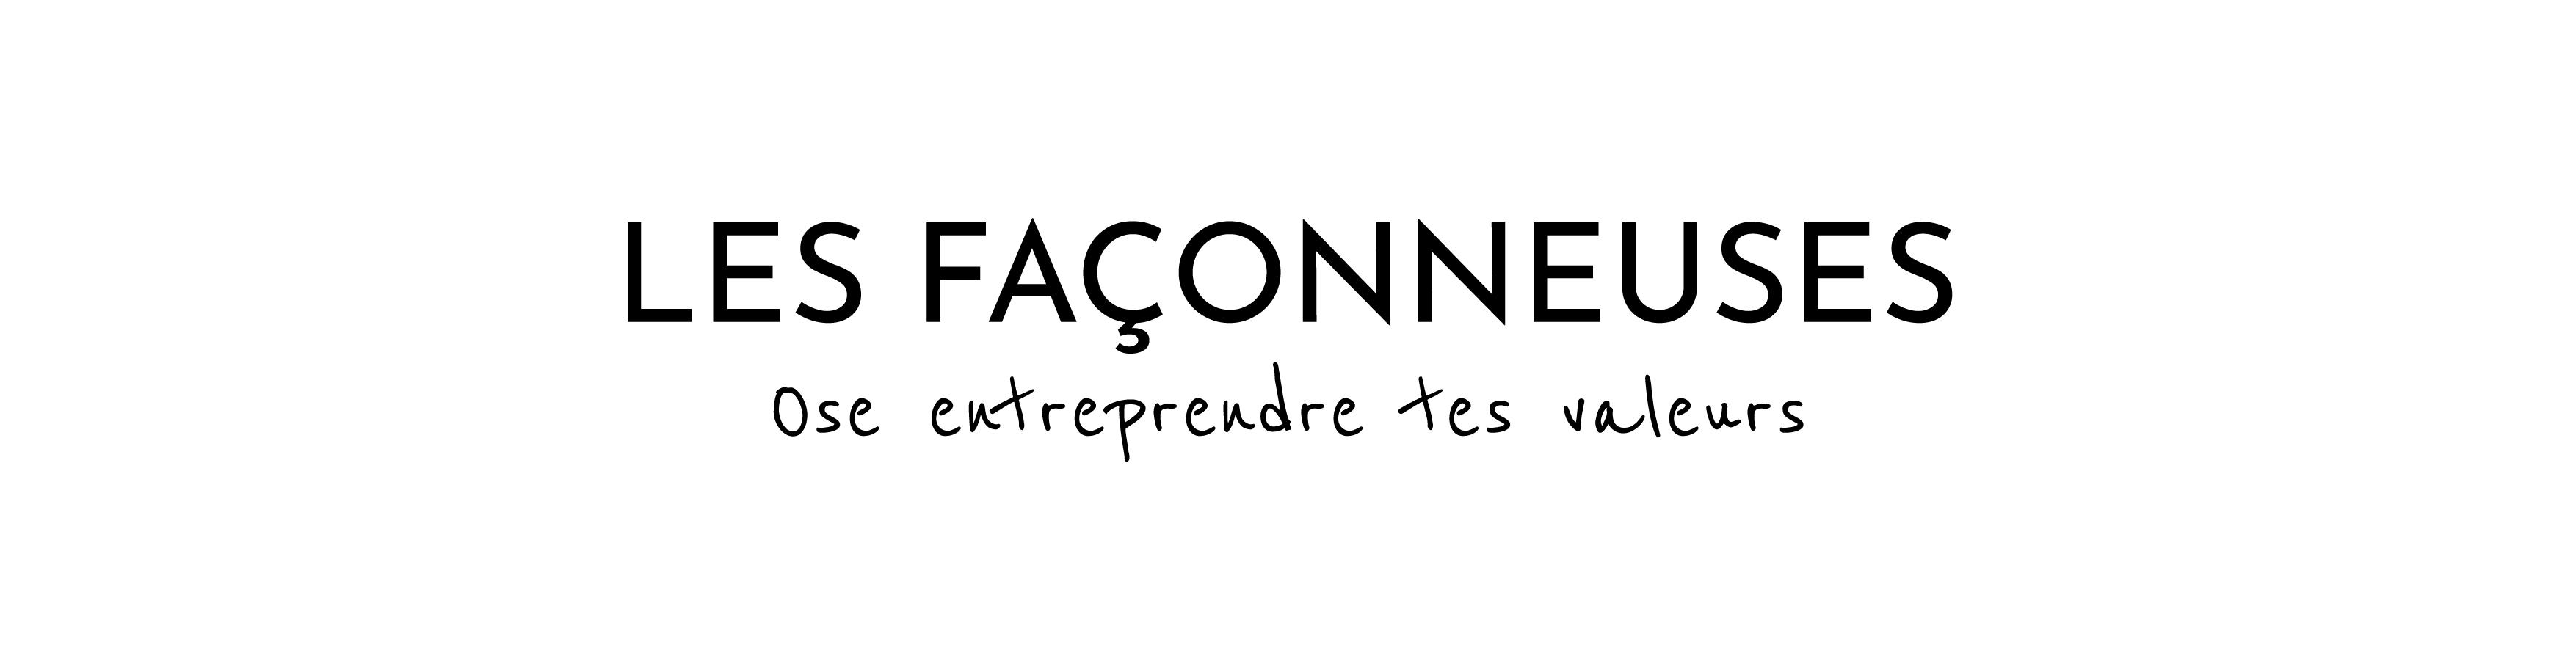 https://www.lesfaconneuses.fr/